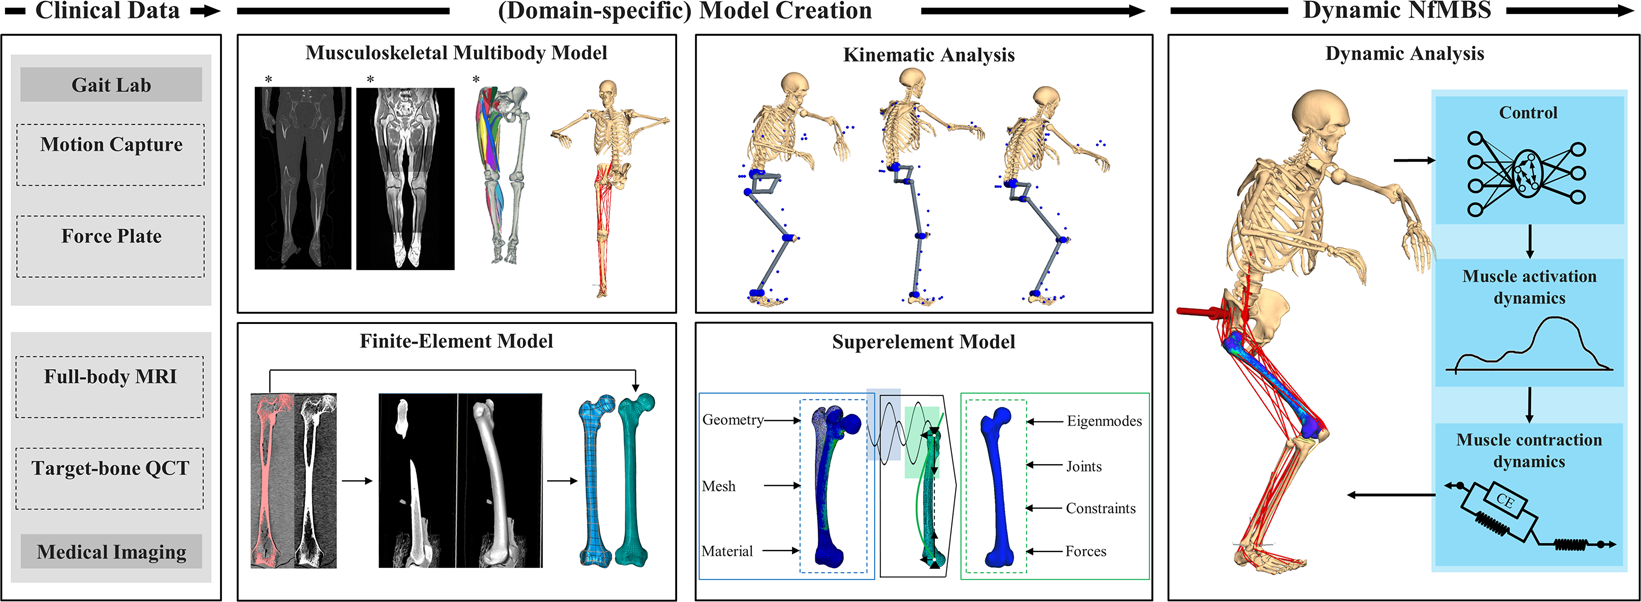 Neuro-musculoskeletal flexible multibody simulation yields a